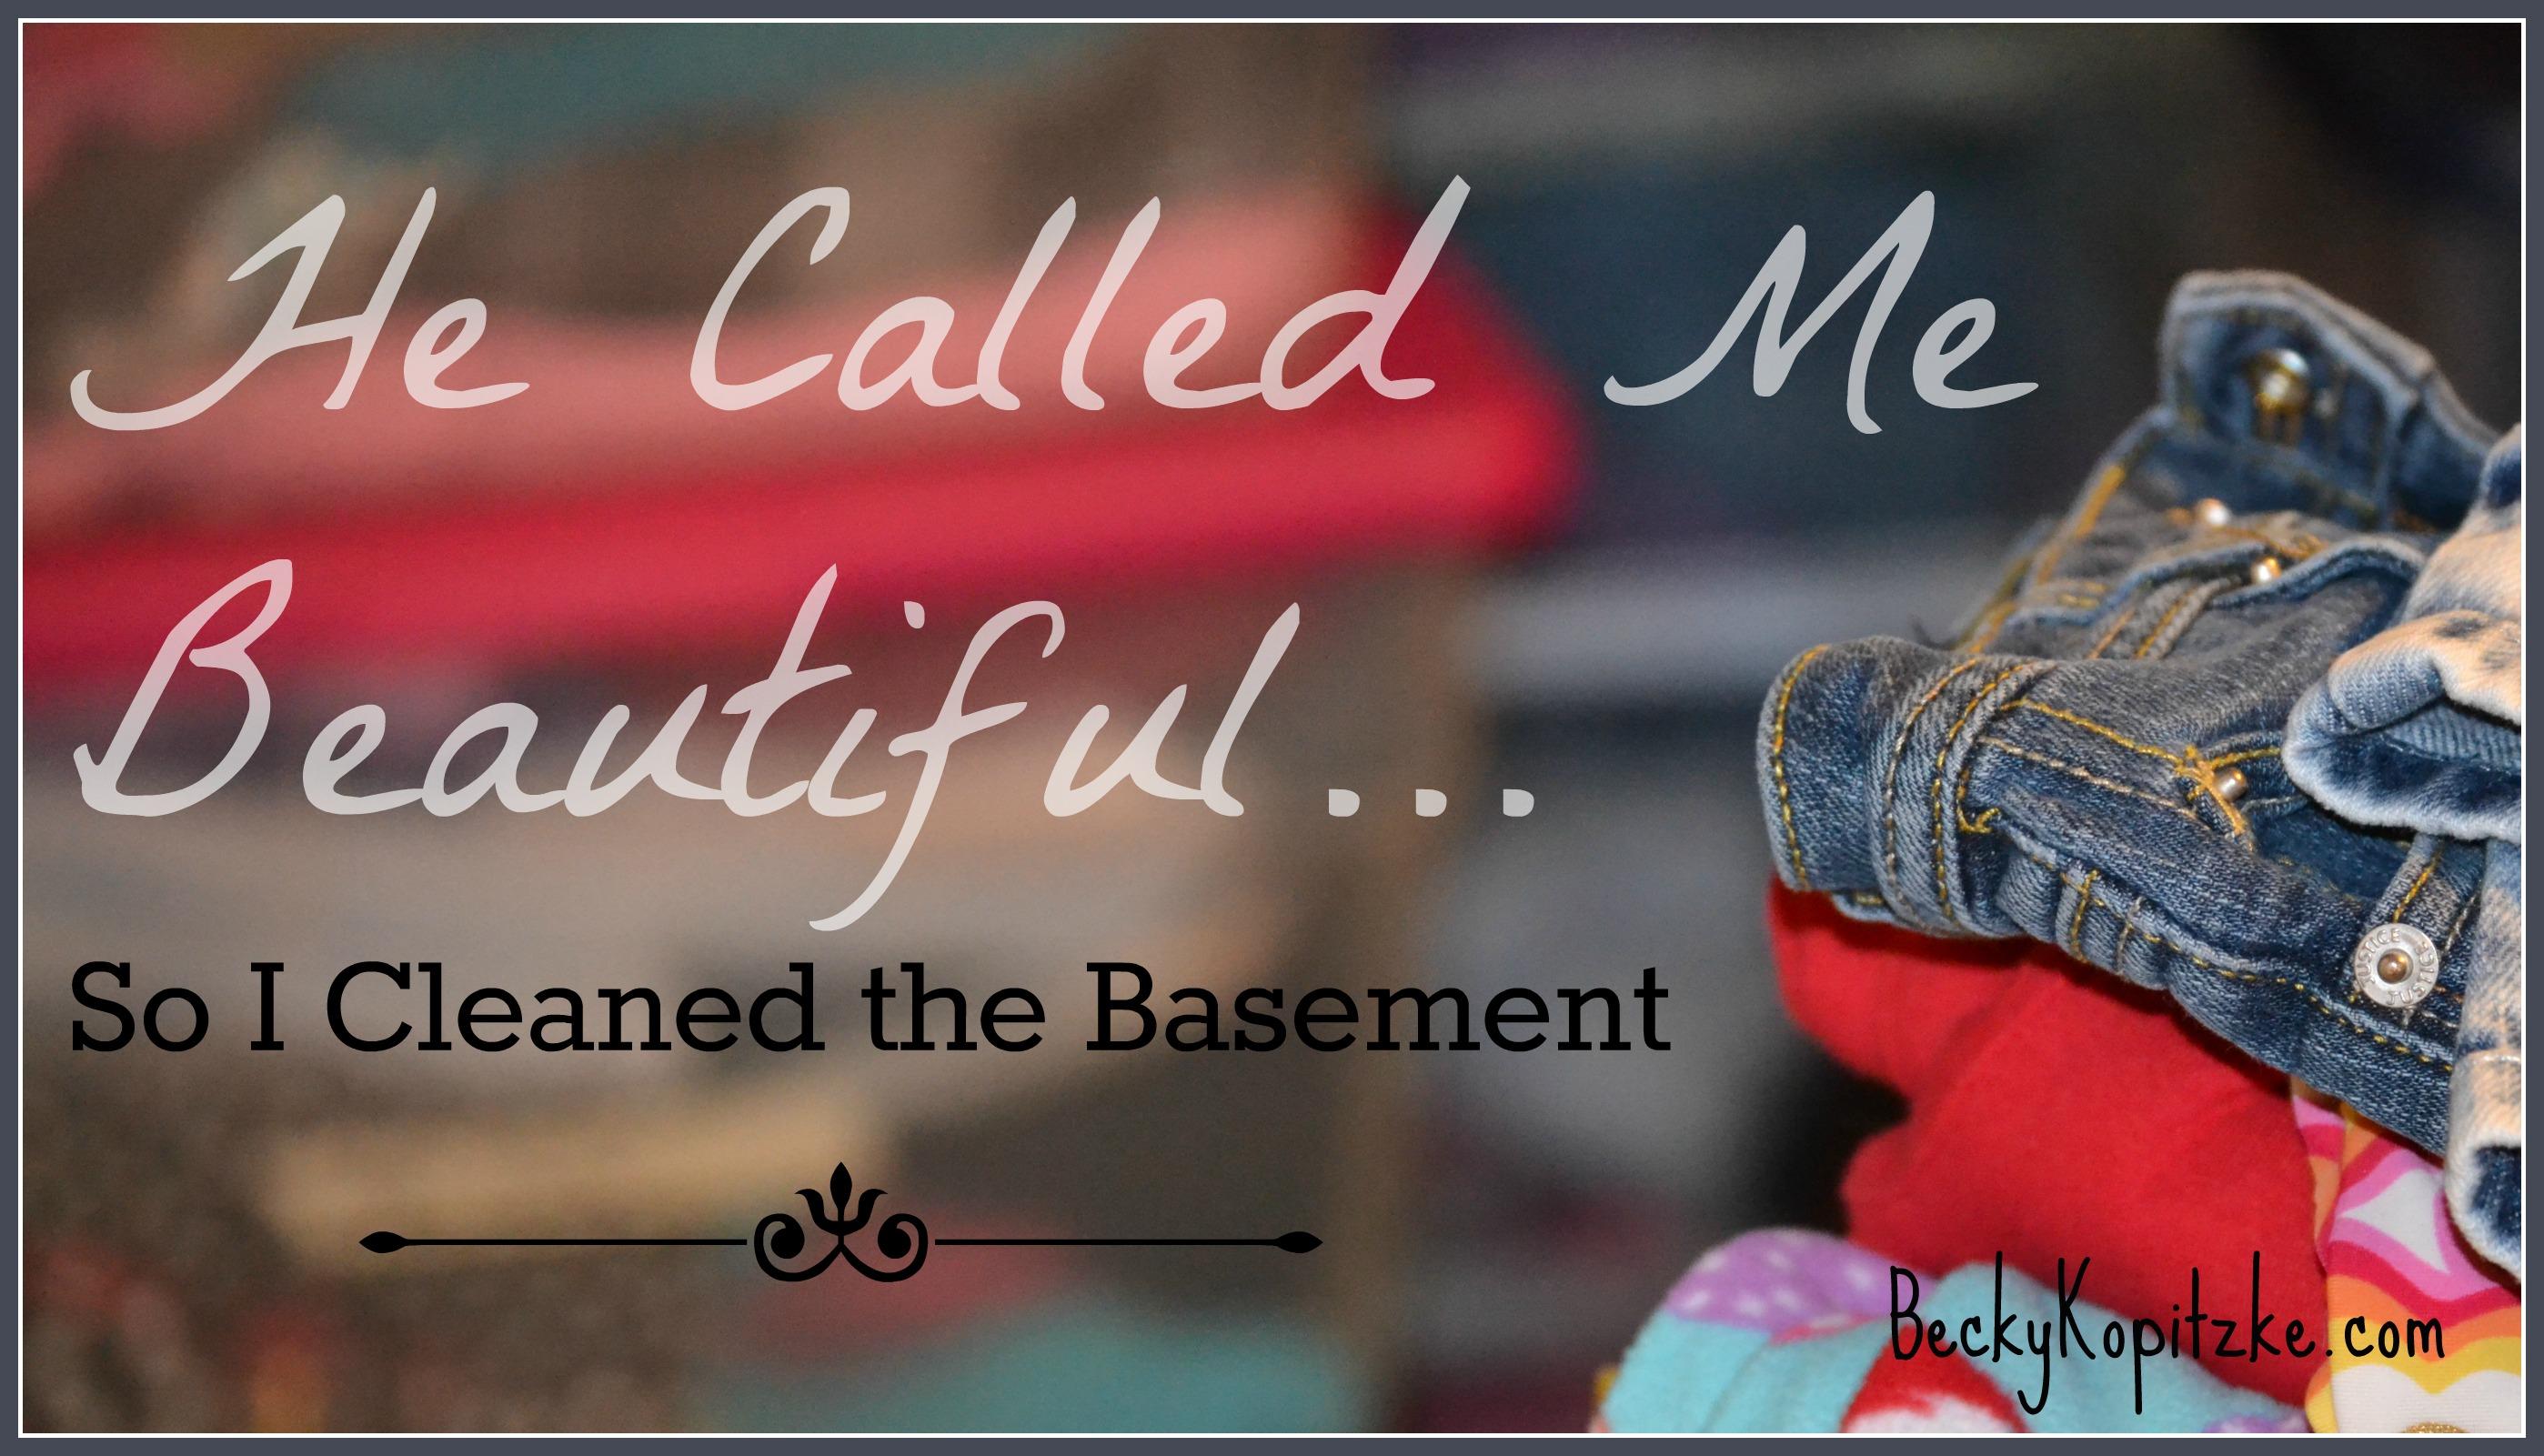 He Called Me Beautiful So I Cleaned the Basement